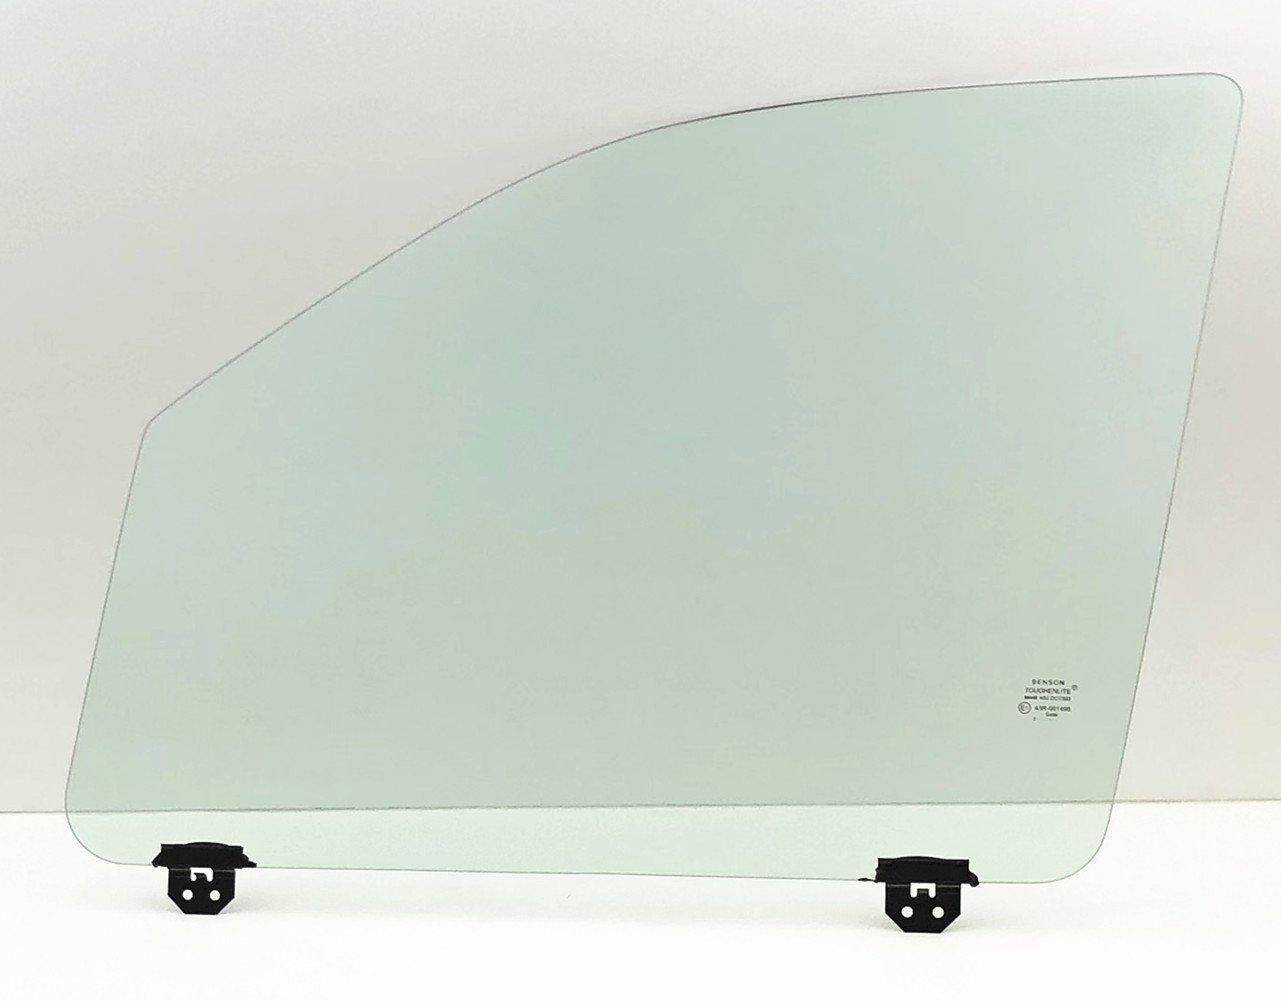 NAGD Compatible with 2002-2010 Ford Explorer /& Mercury Mountaineer 4 Door Utility Driver Side Left Front Door Glass